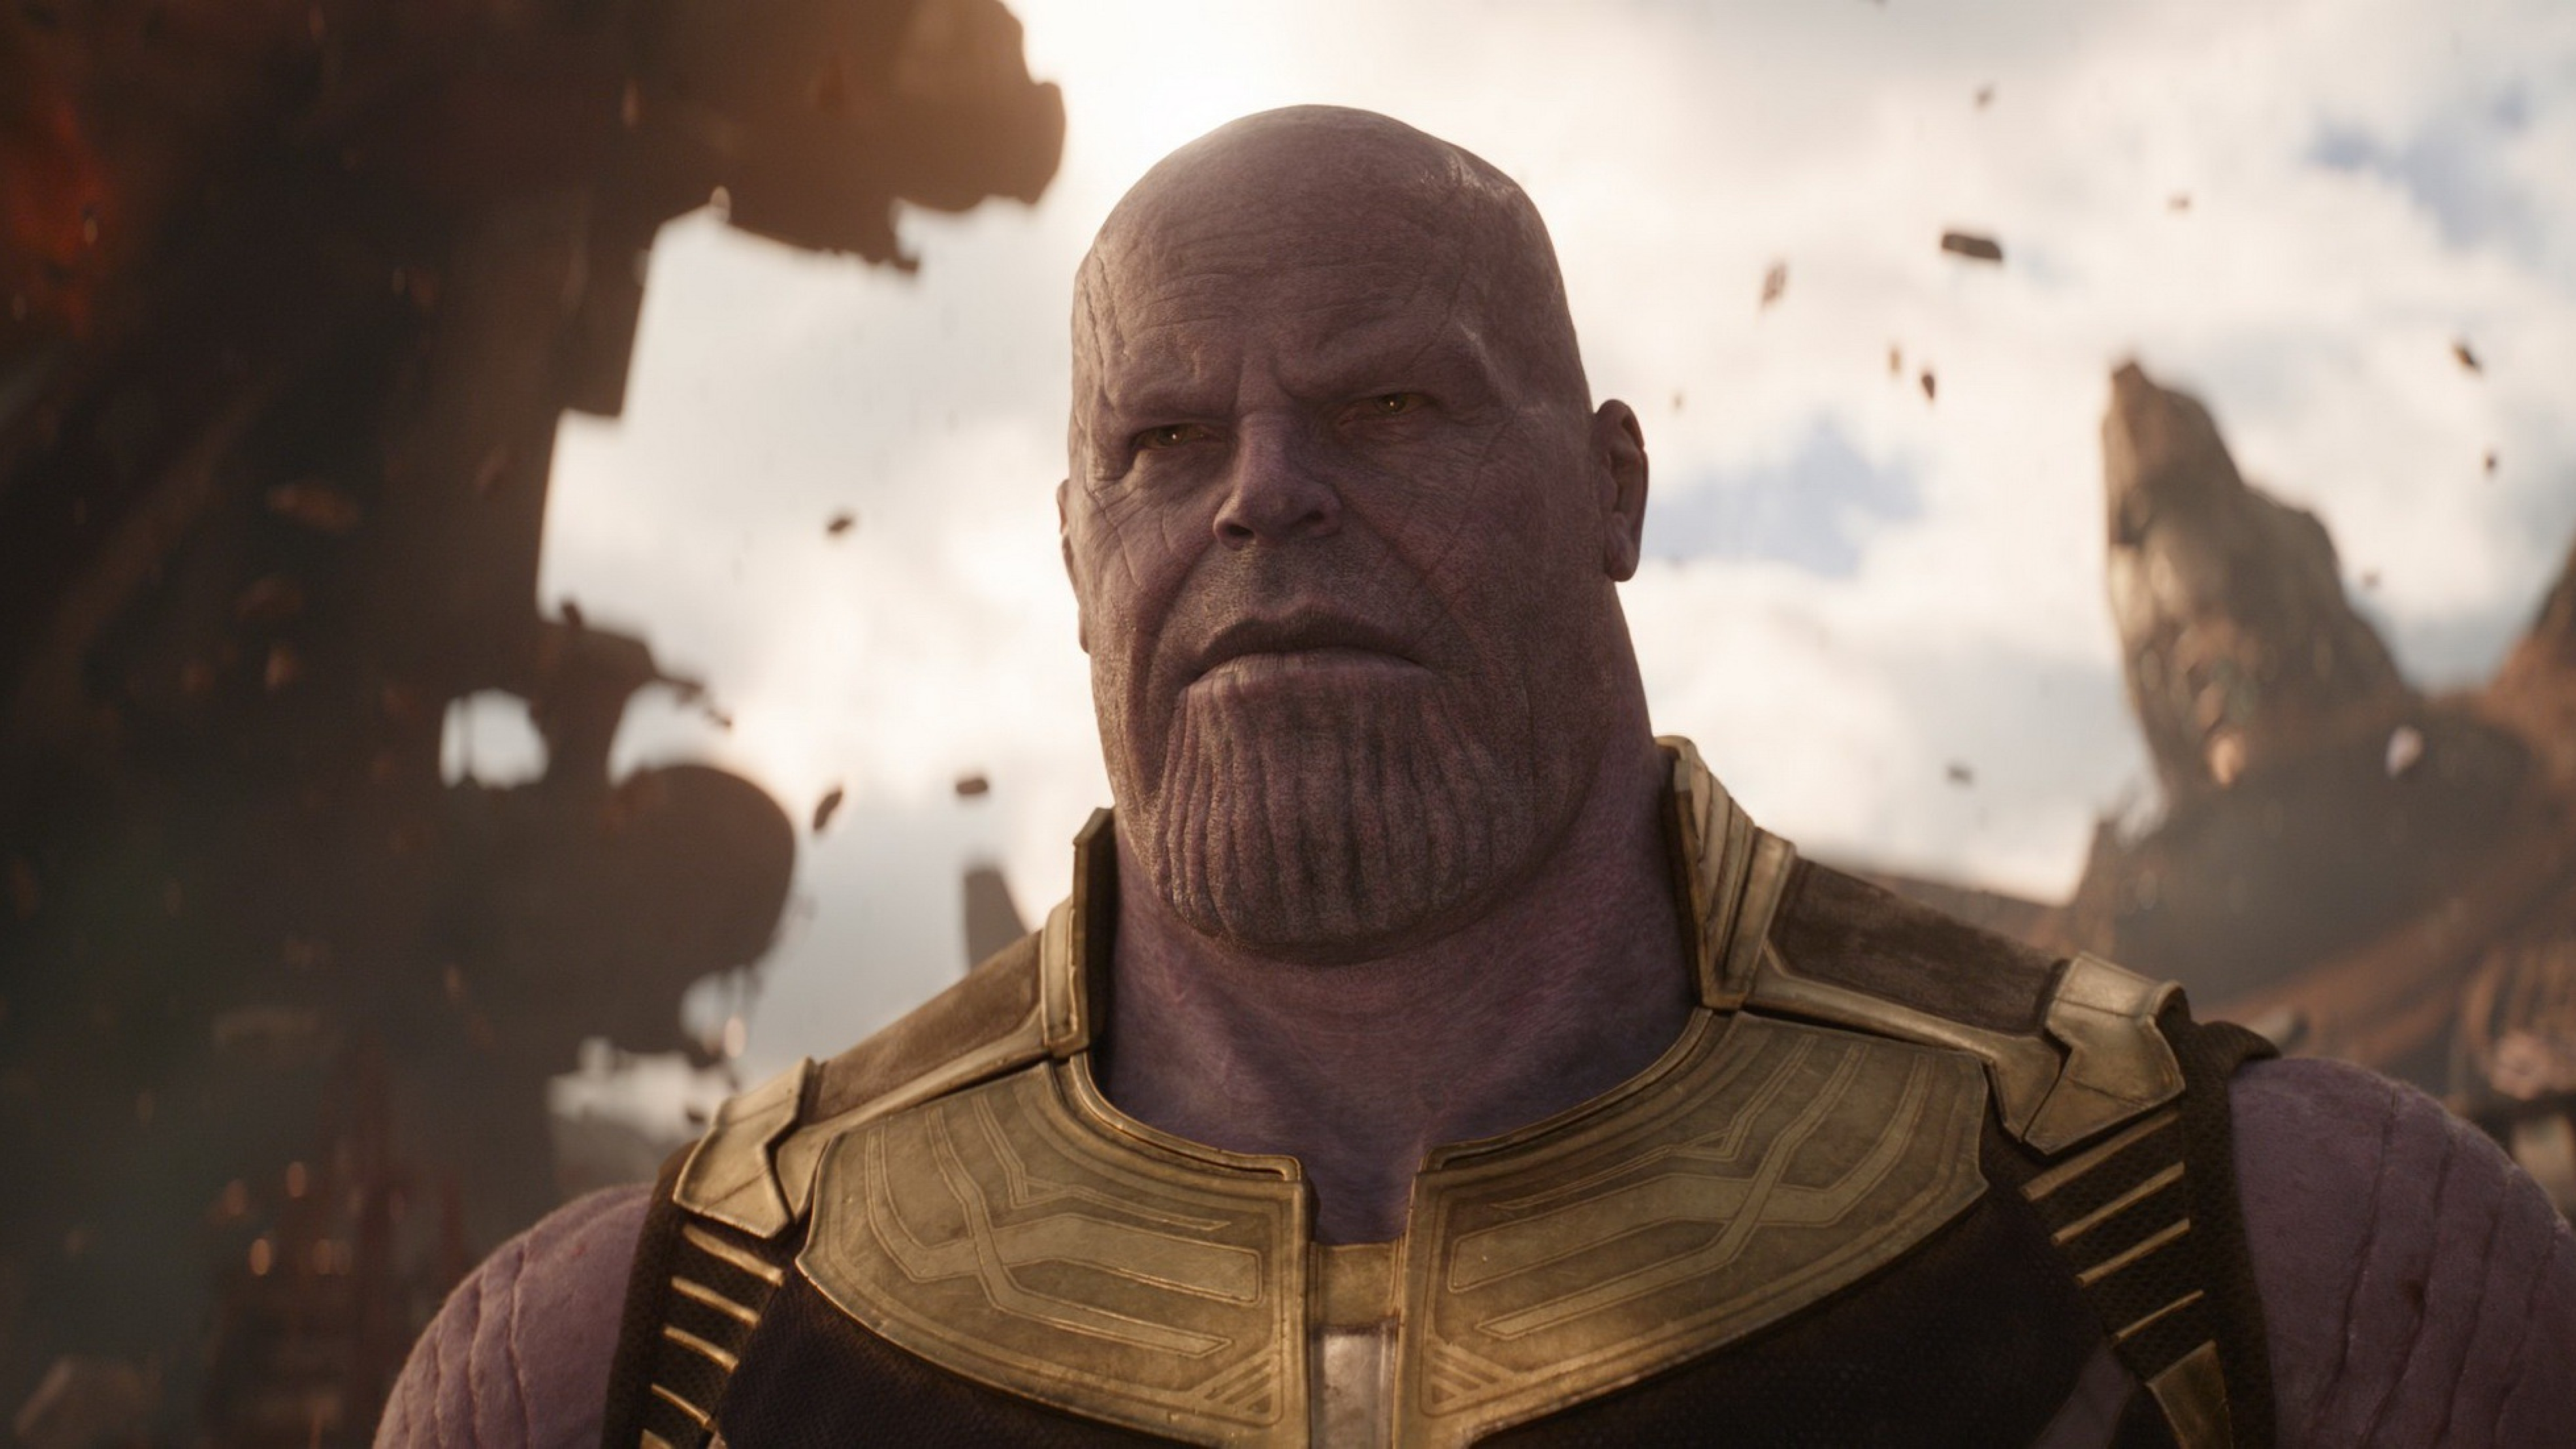 Josh Brolin As Thanos In Avengers Infinity War 2018, Full ...